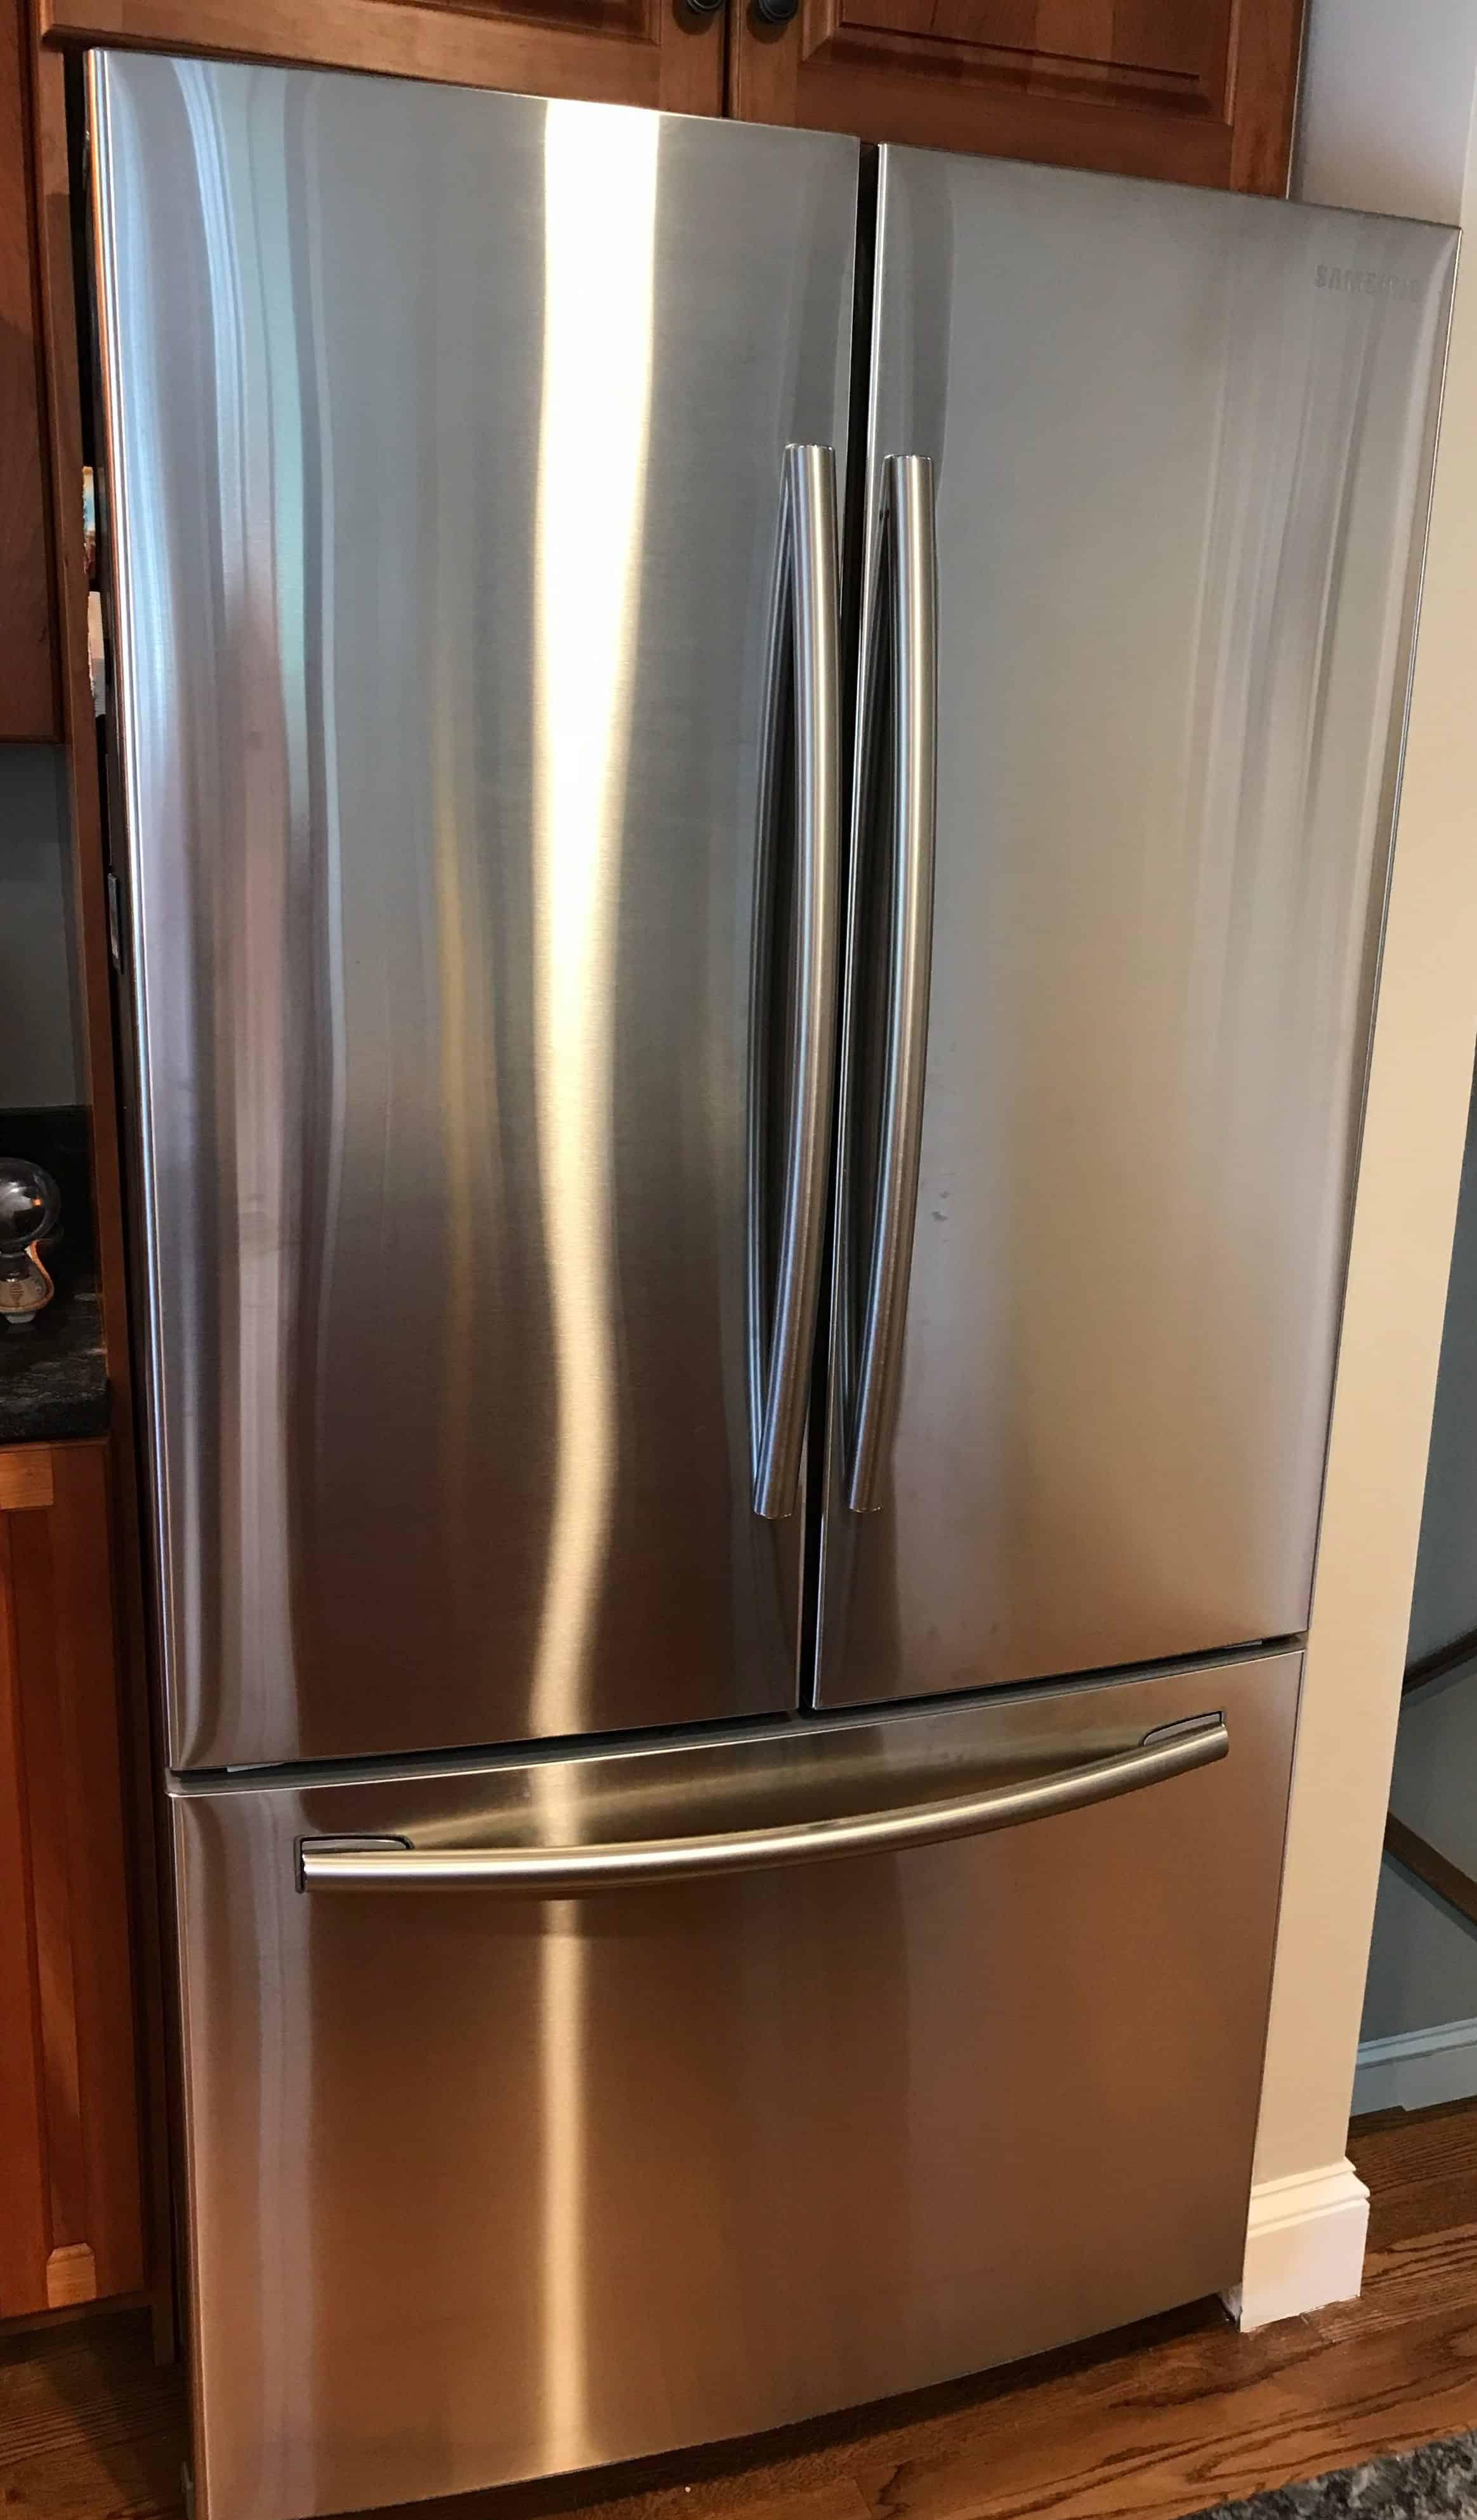 samsung rf261beaesr refrigerator